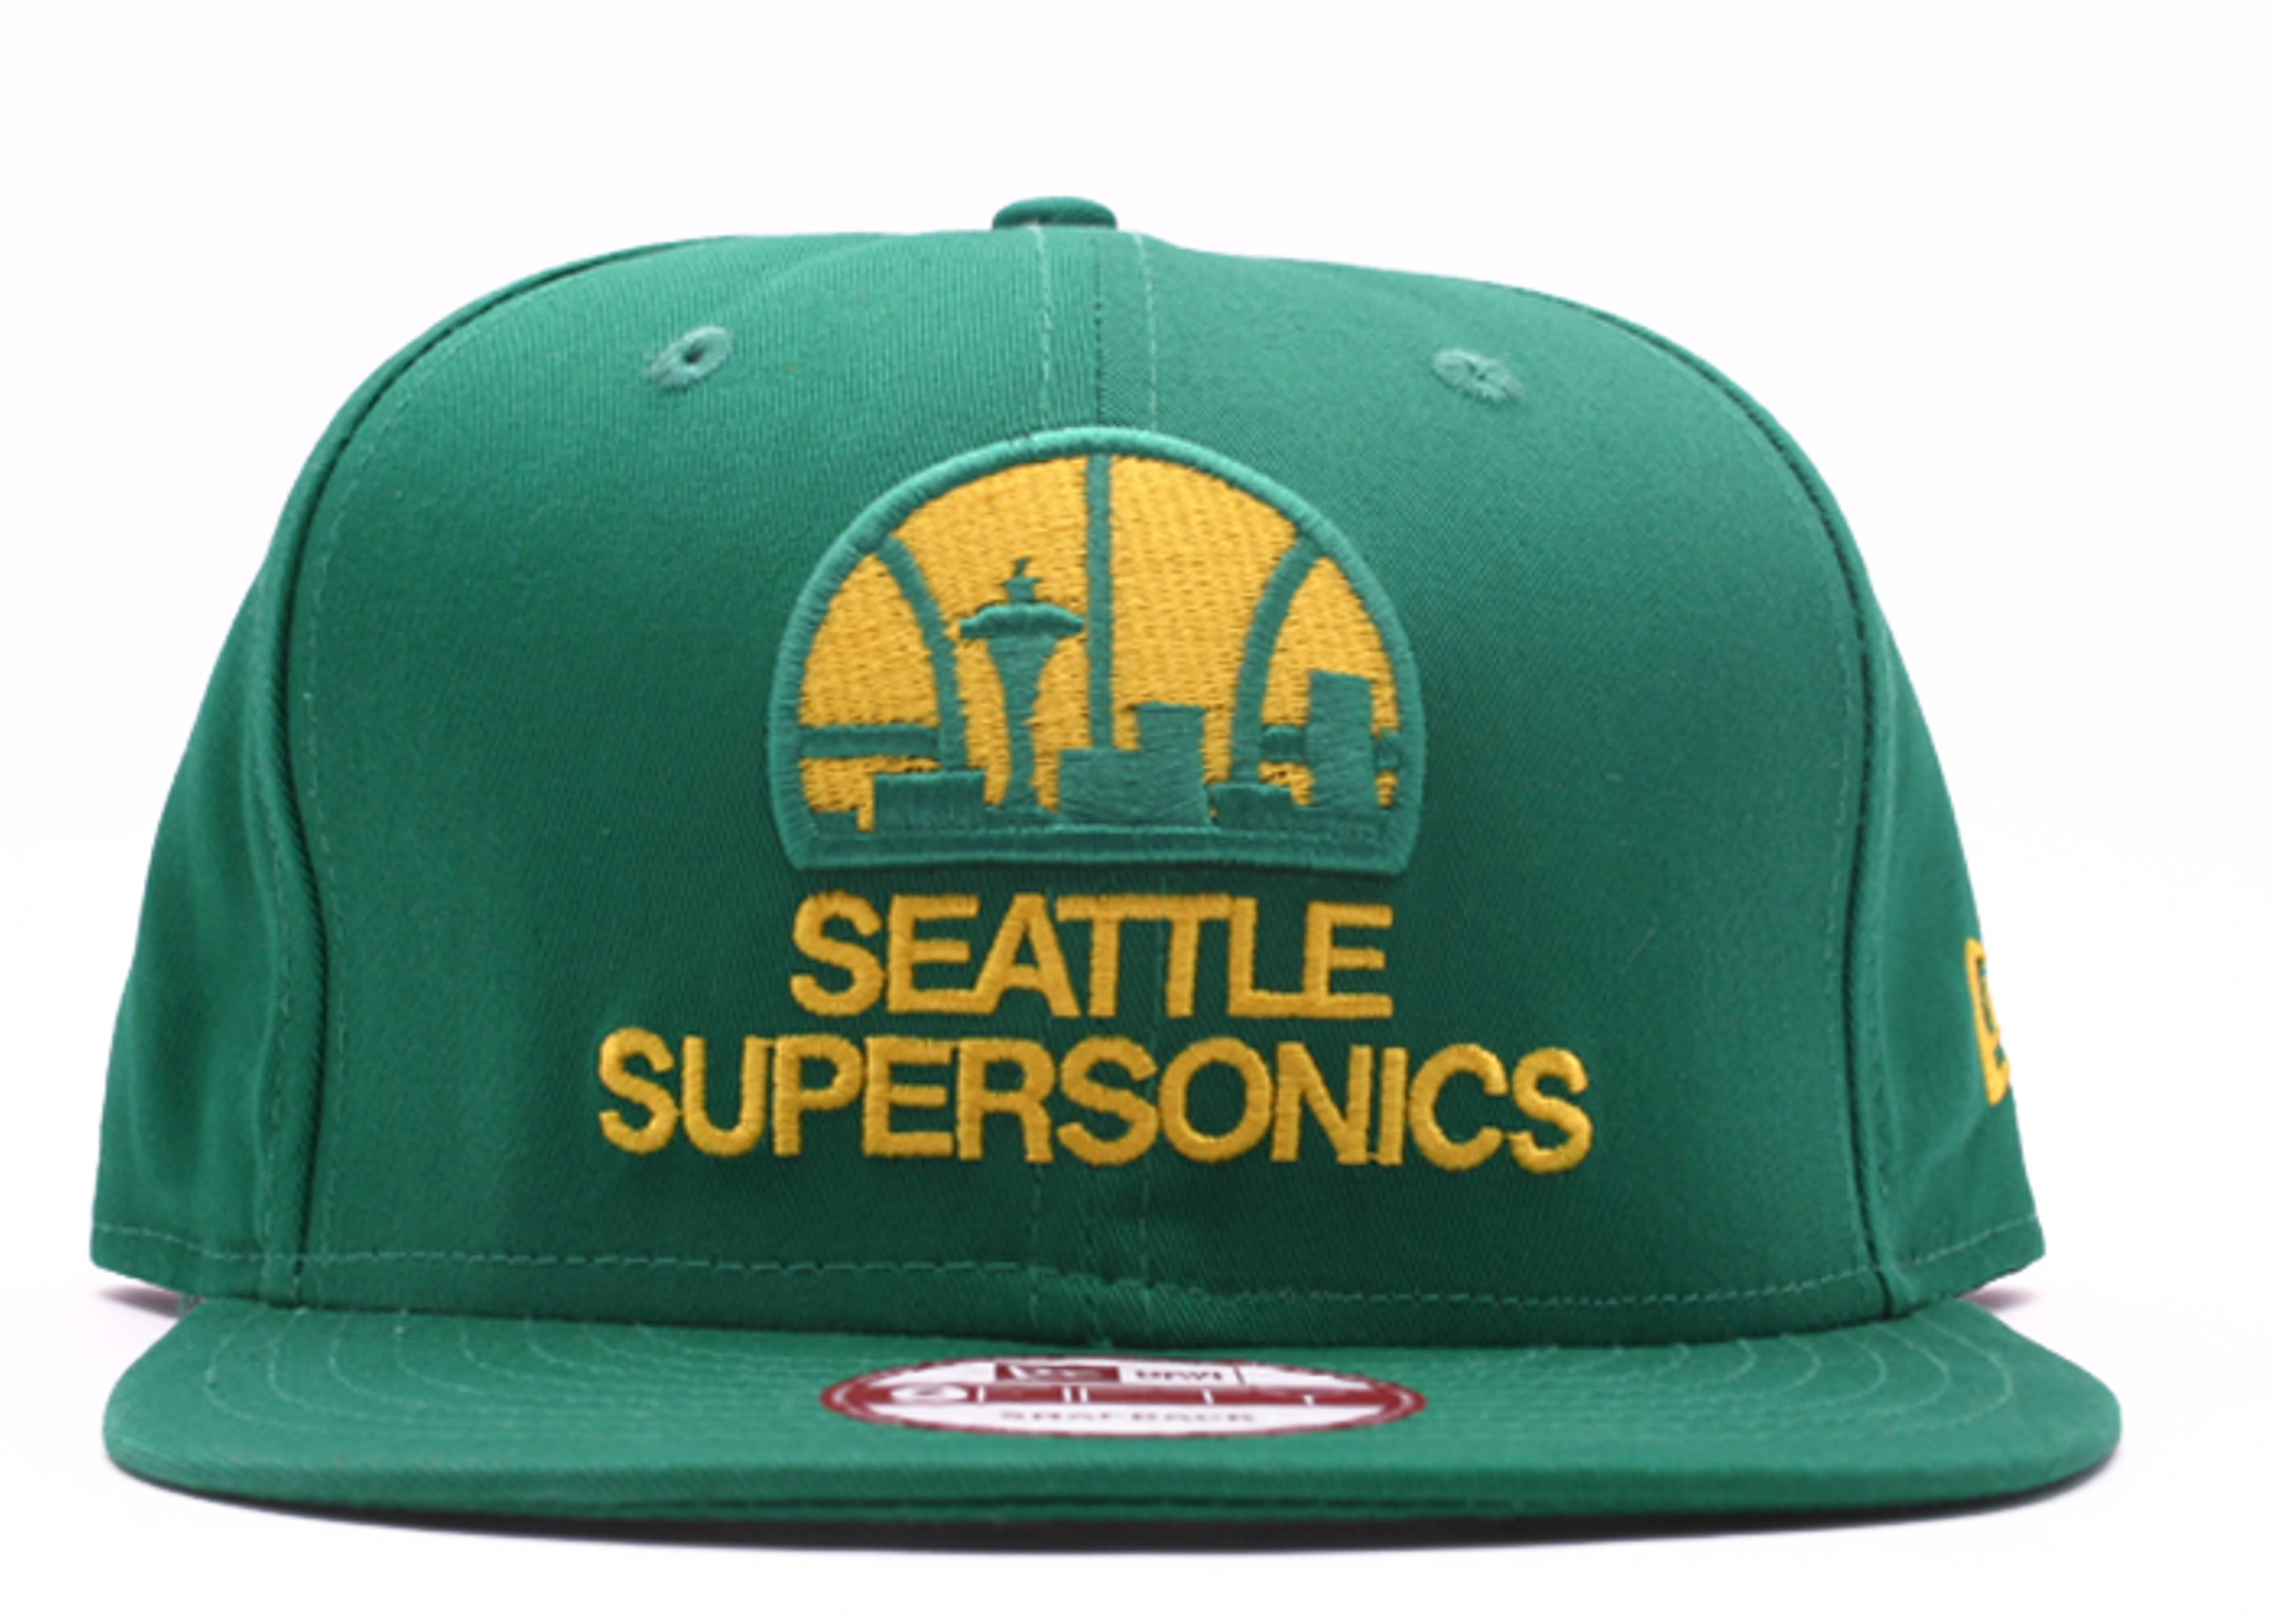 seattle supersonics snap-back